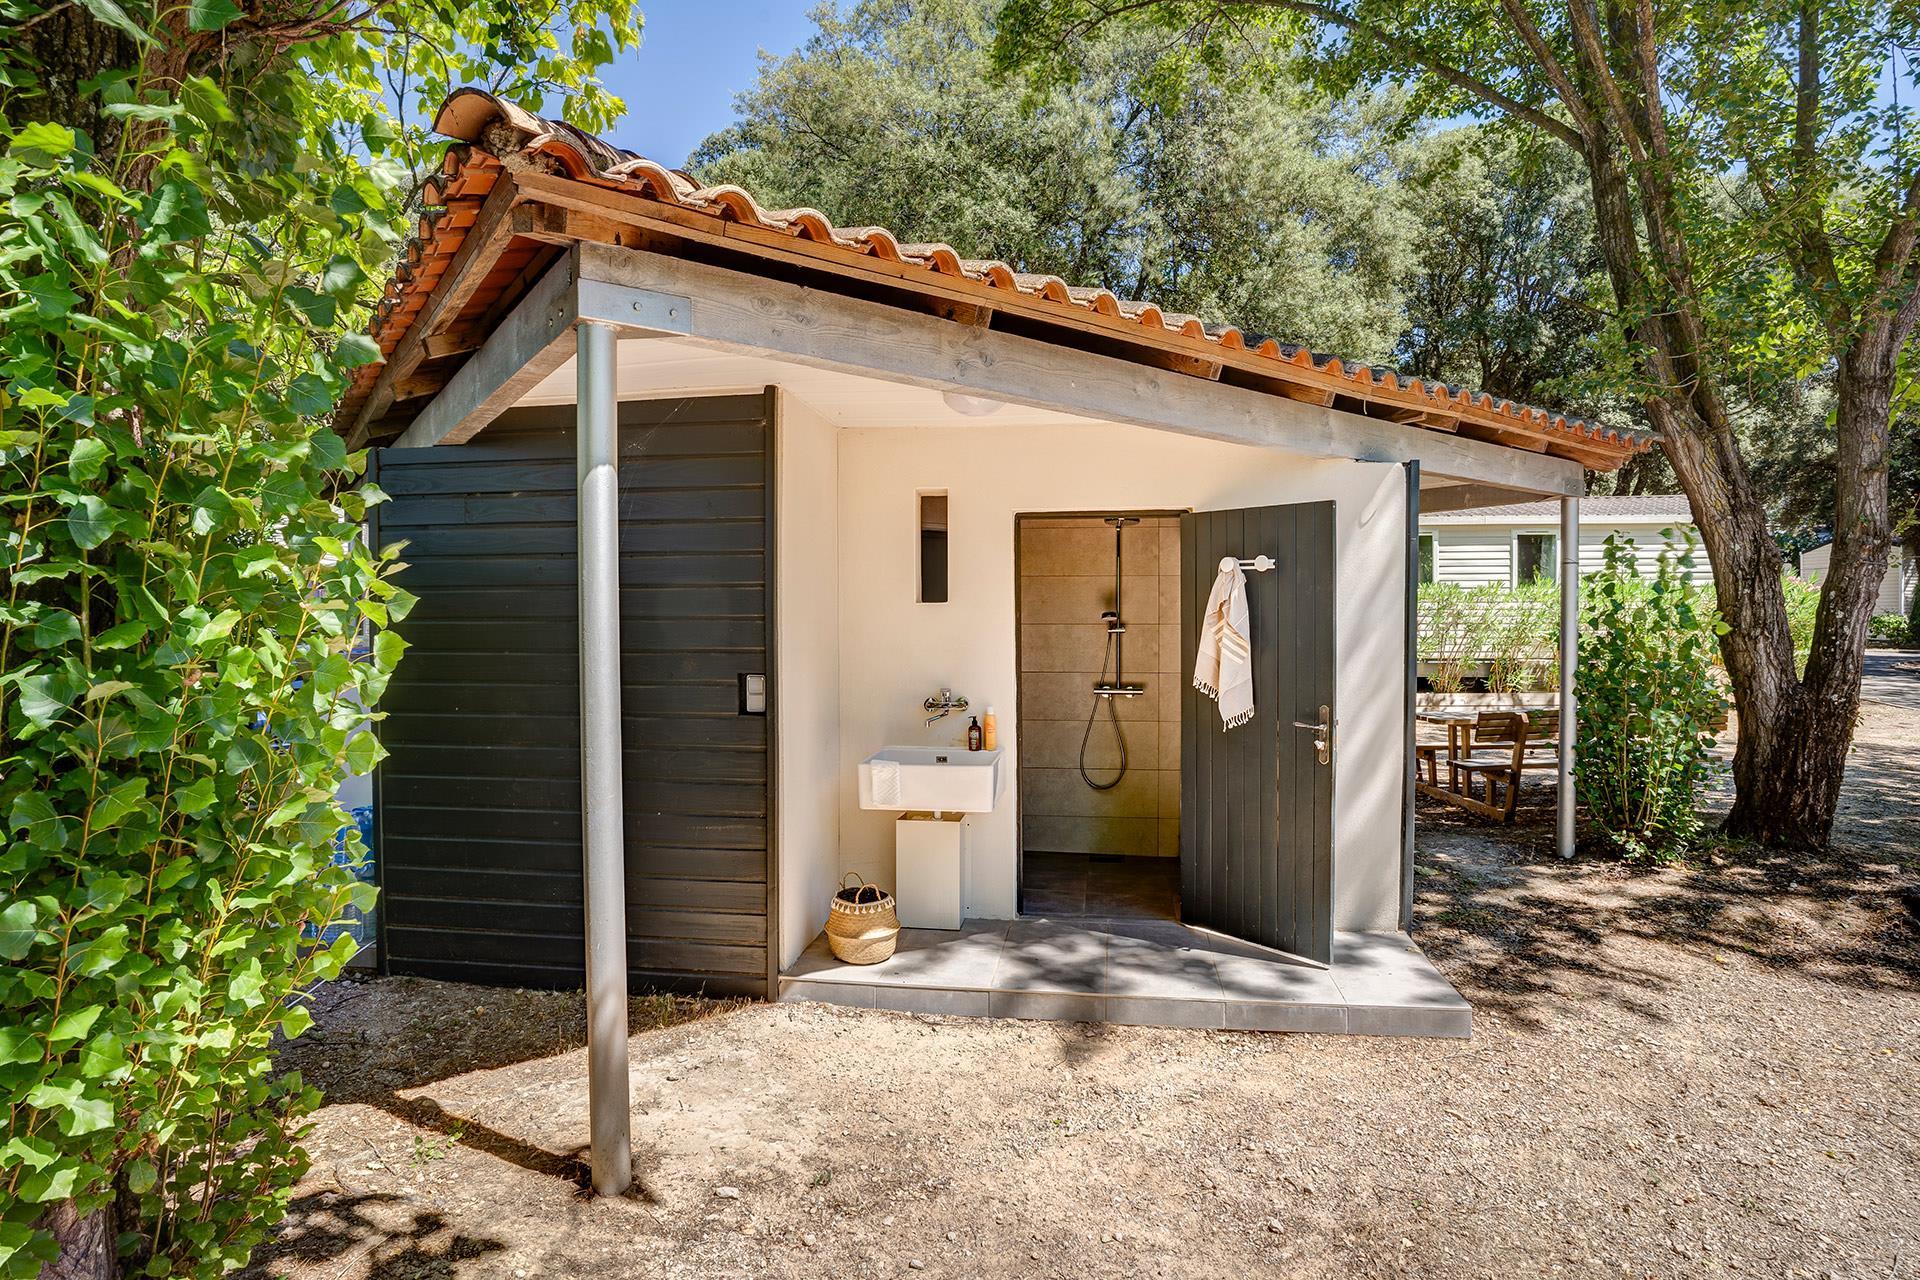 Emplacement - Emplacement Premium - Camping Sandaya Plein Air des Chênes